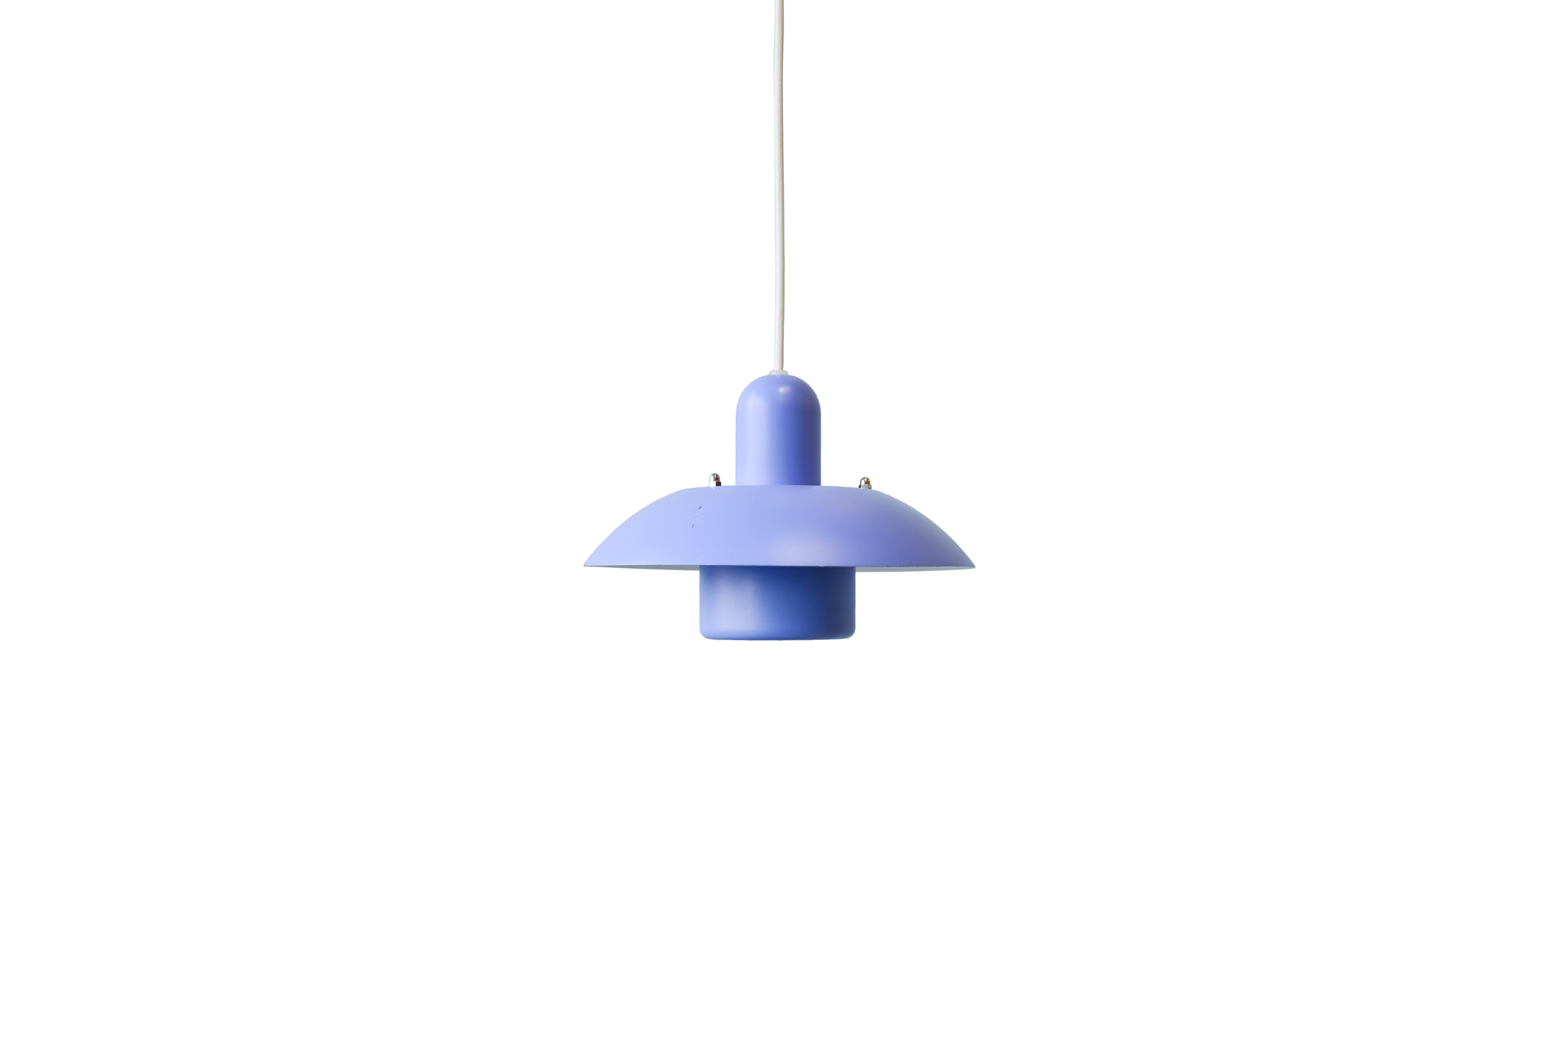 Danish Vintage Pendant Light by Form Light Type 52522/デンマークヴィンテージ ペンダントライト 間接照明 北欧モダン ミッドセンチュリー